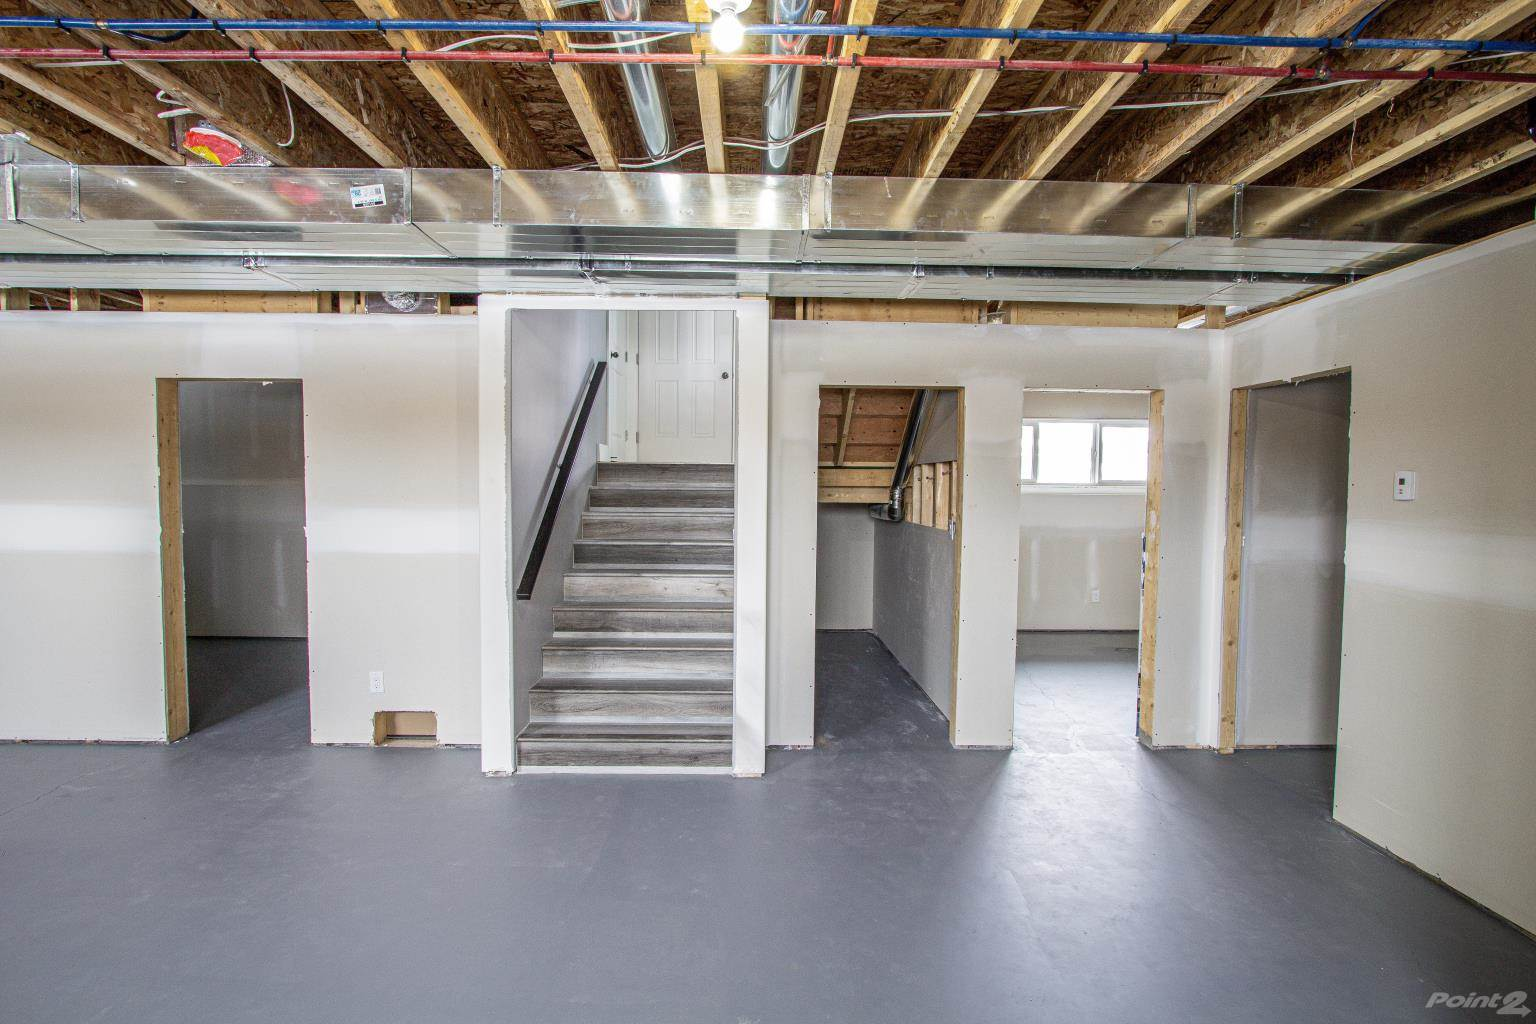 215 Terra Nova Cres in Cold Lake - House For Sale : MLS# e4225242 Photo 15